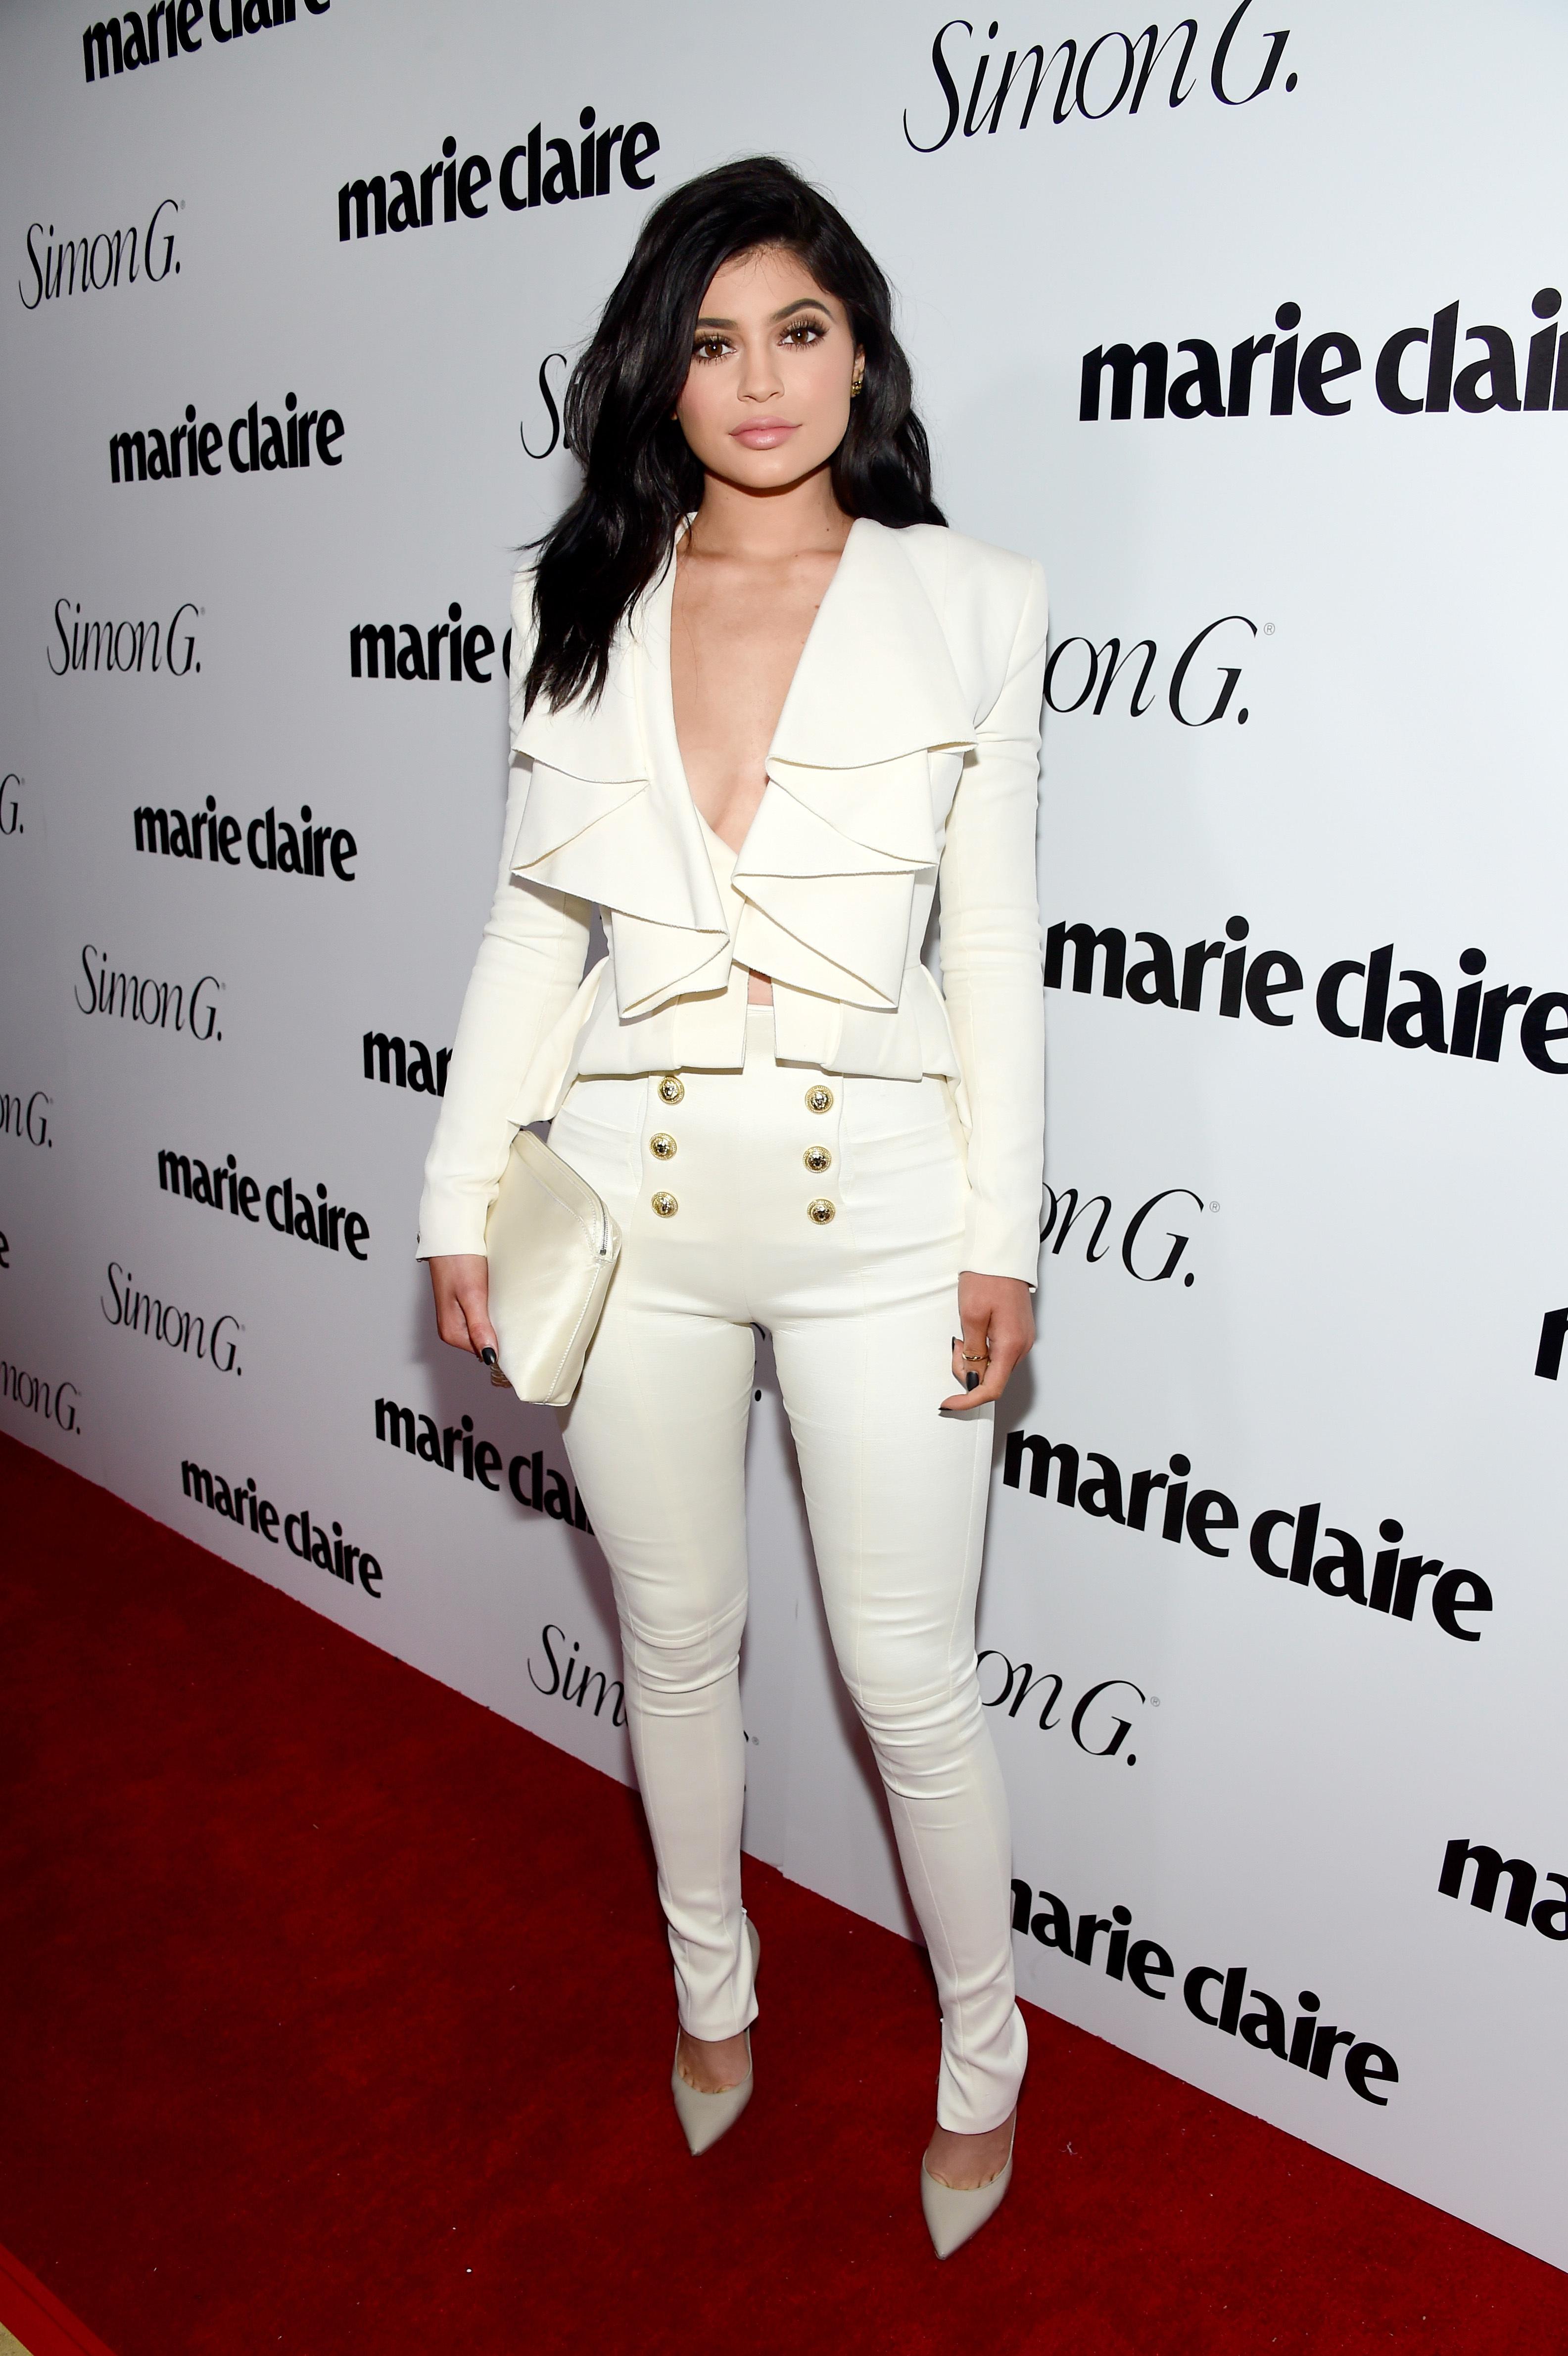 Kylie Jenner: I do consider myself a feminist